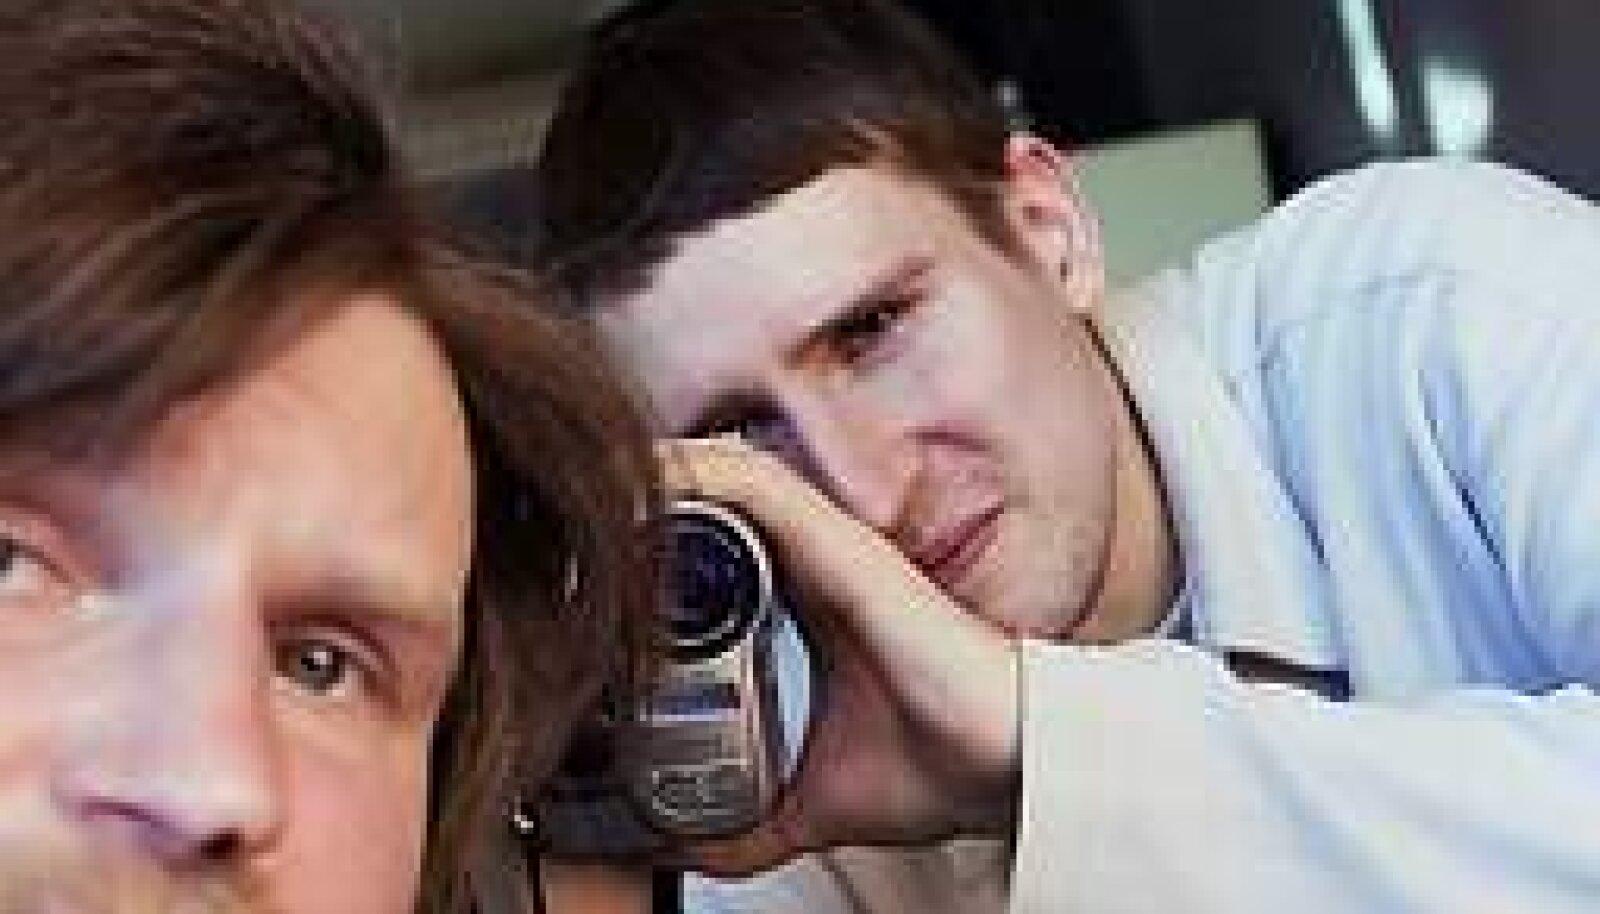 TARTLASEGA TALLINNAS: Režissöör Jaan-Jürgen Klaus (paremal) tõi boheemliku trubaduuri Erkki Hüva pealinna kõrgkultuuri õppima. VALLO KRUUSER